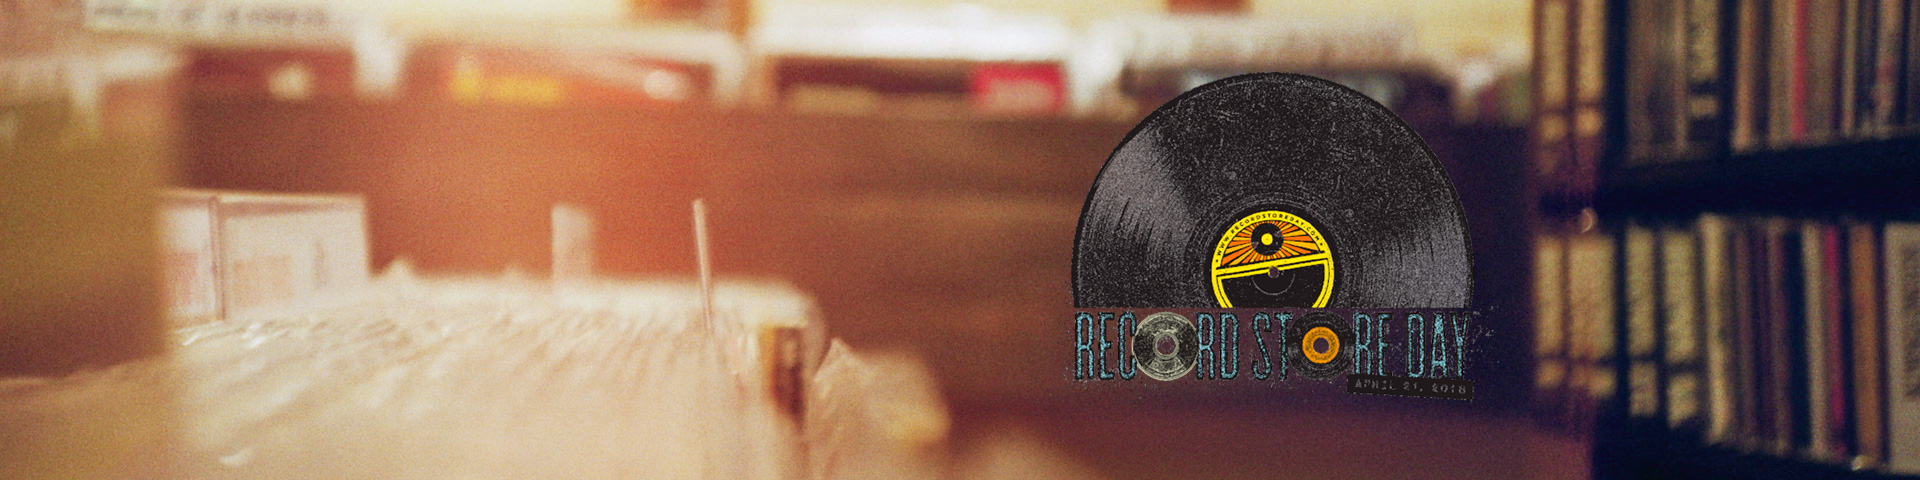 Record Store Day 2018 Danmark